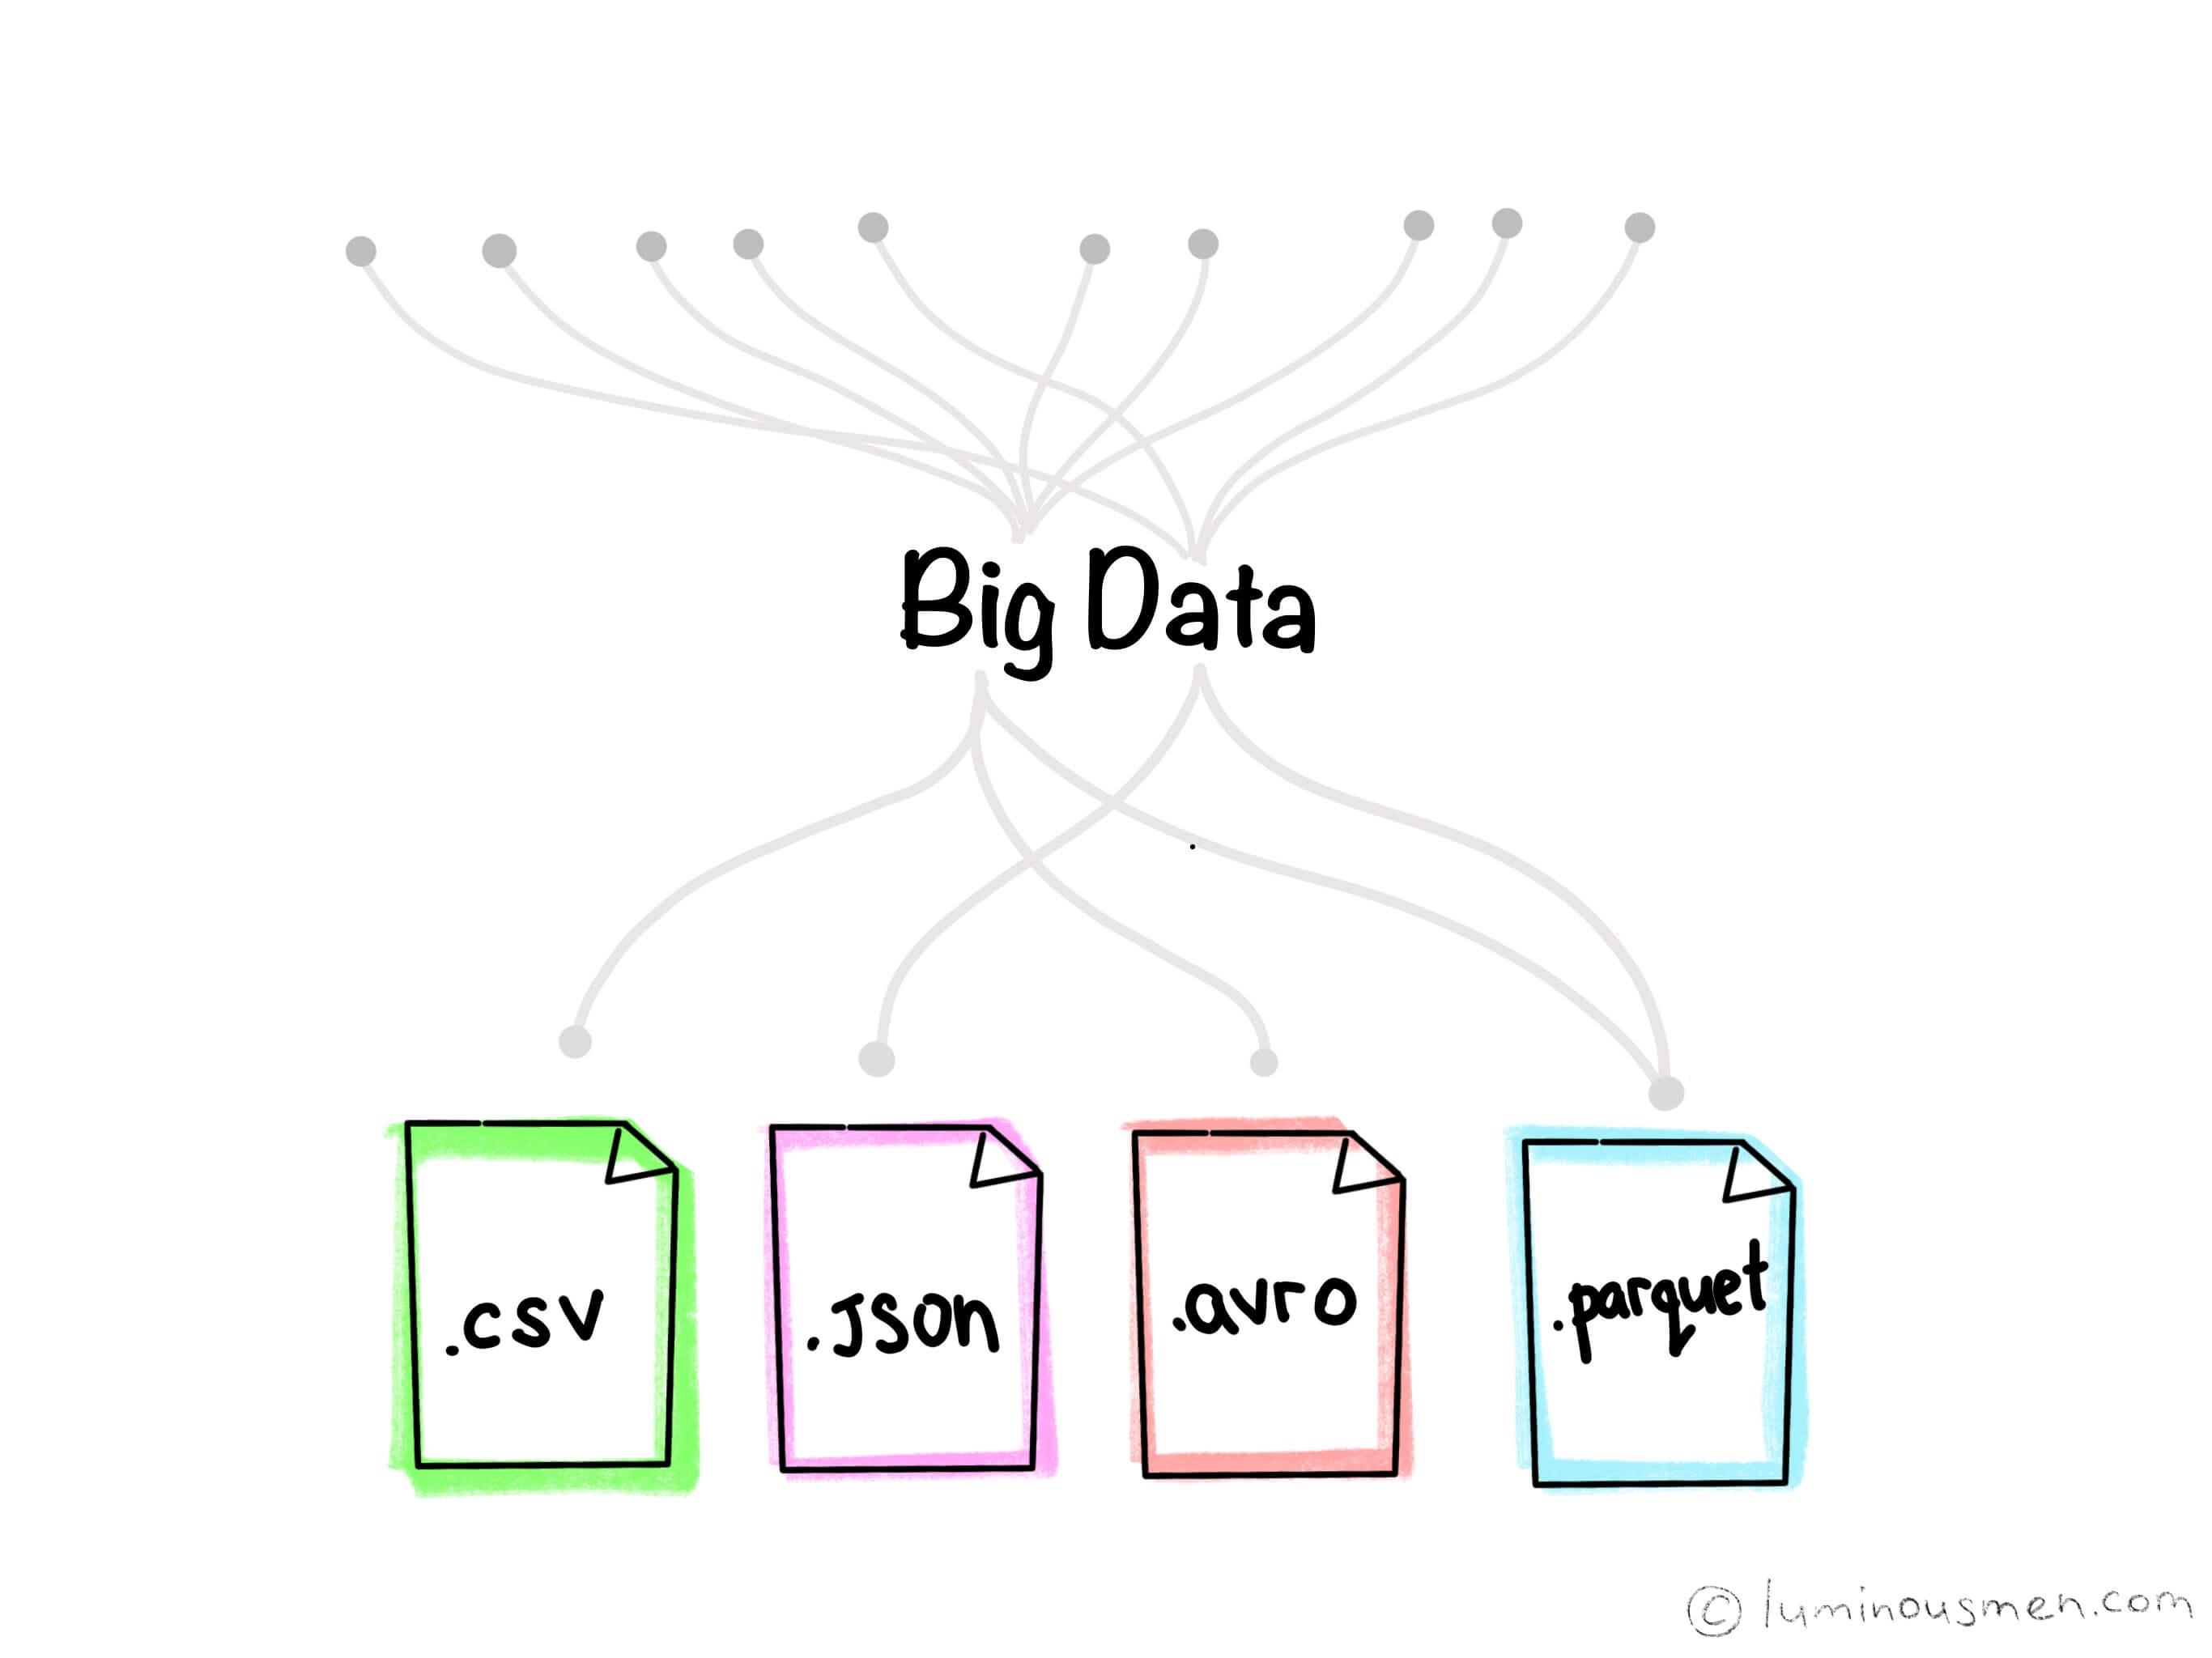 Big Data file formats